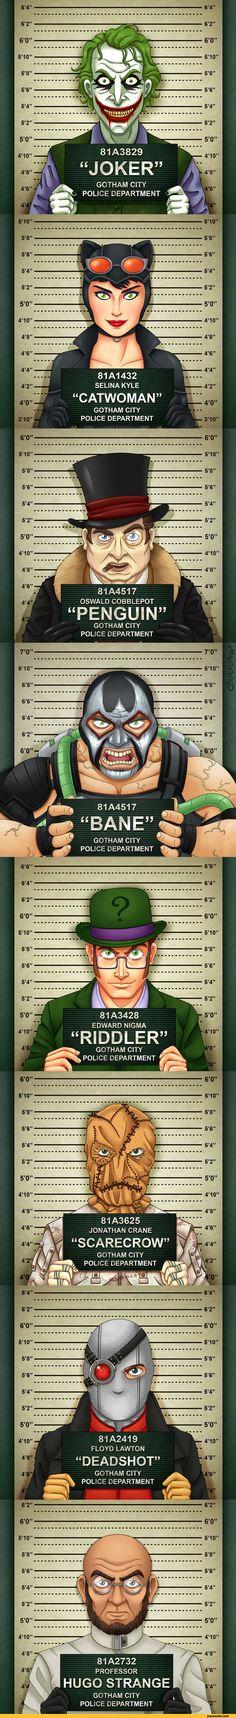 811432SELINA KYLECATWOMANGOTHAM CITY POLICE DEPARTMENT81A4517OSWALD COBBLEPOTPENGUINGOTHAM CITY POLICE DEPARTMENT,Batman,DC Comics,villain,mugshots